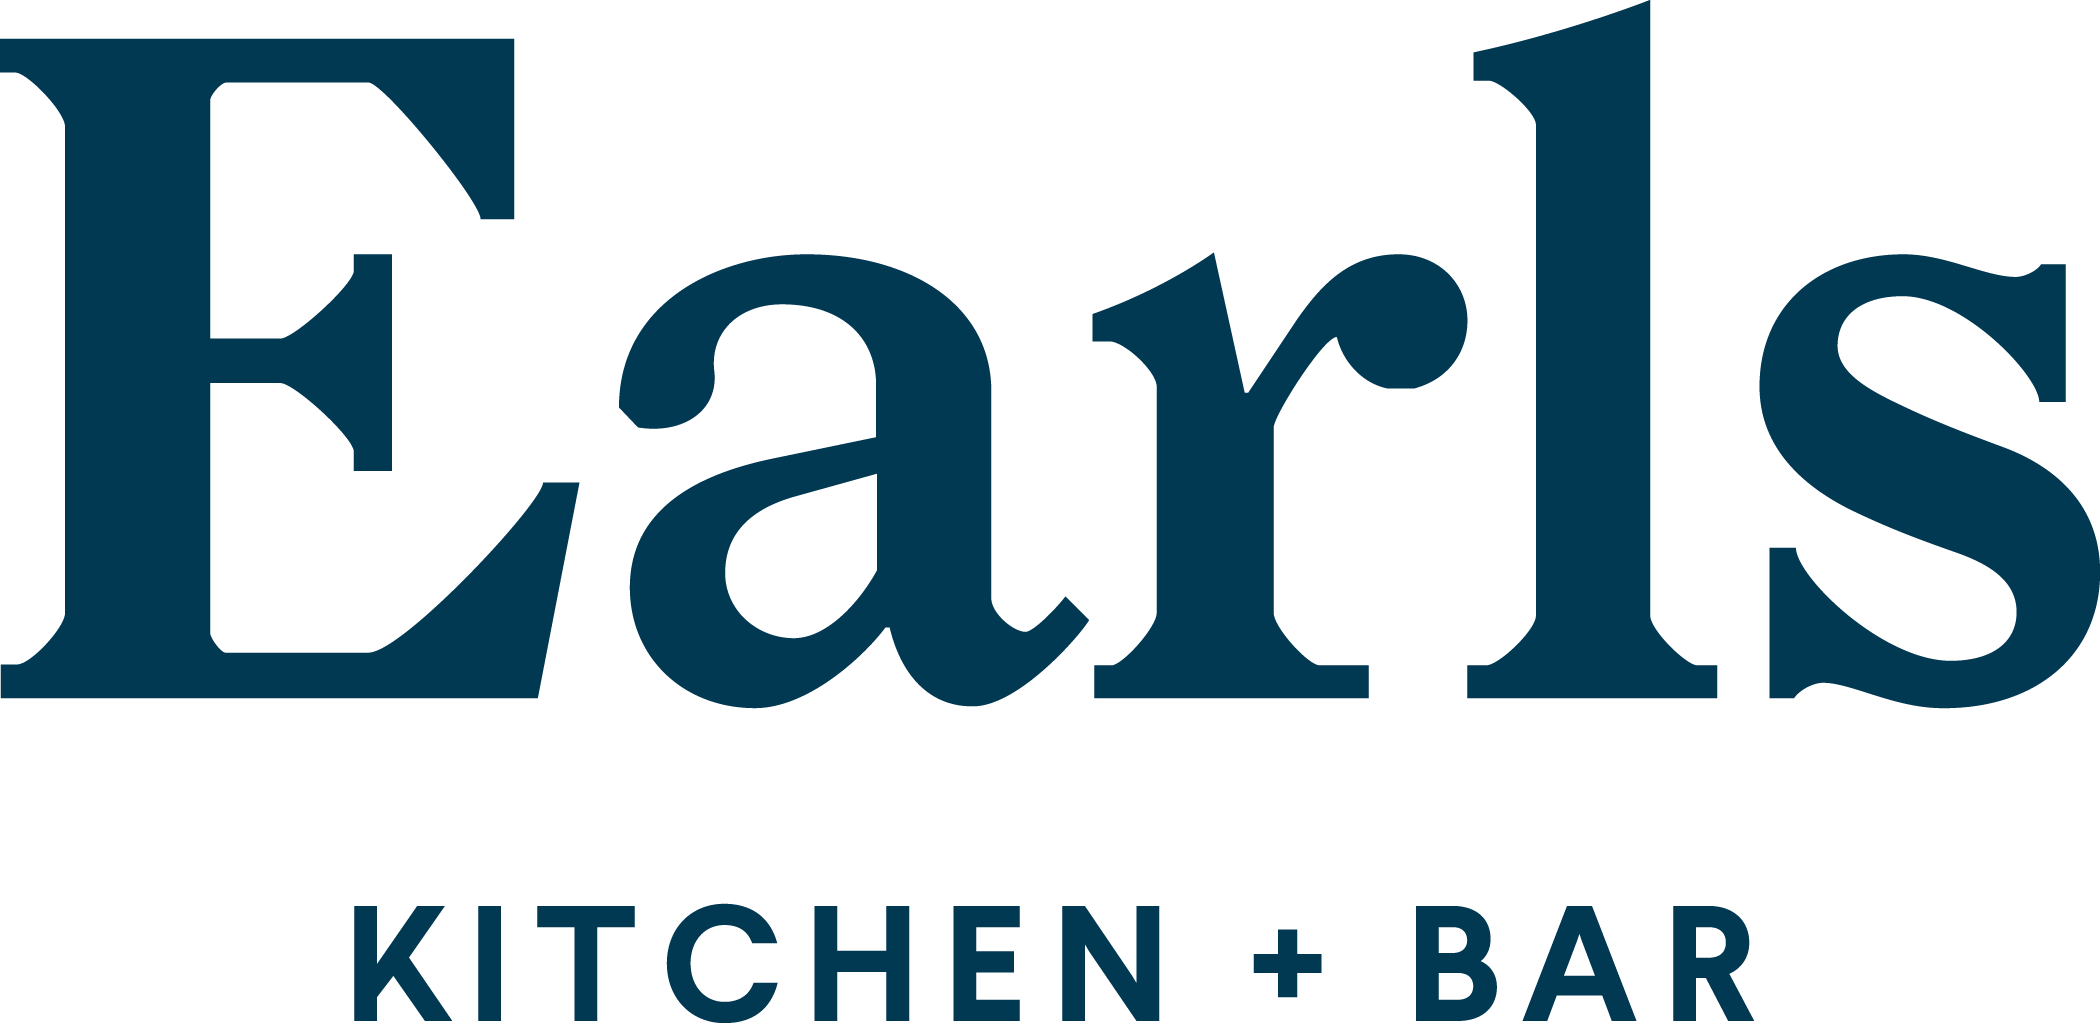 Earls_logo.png